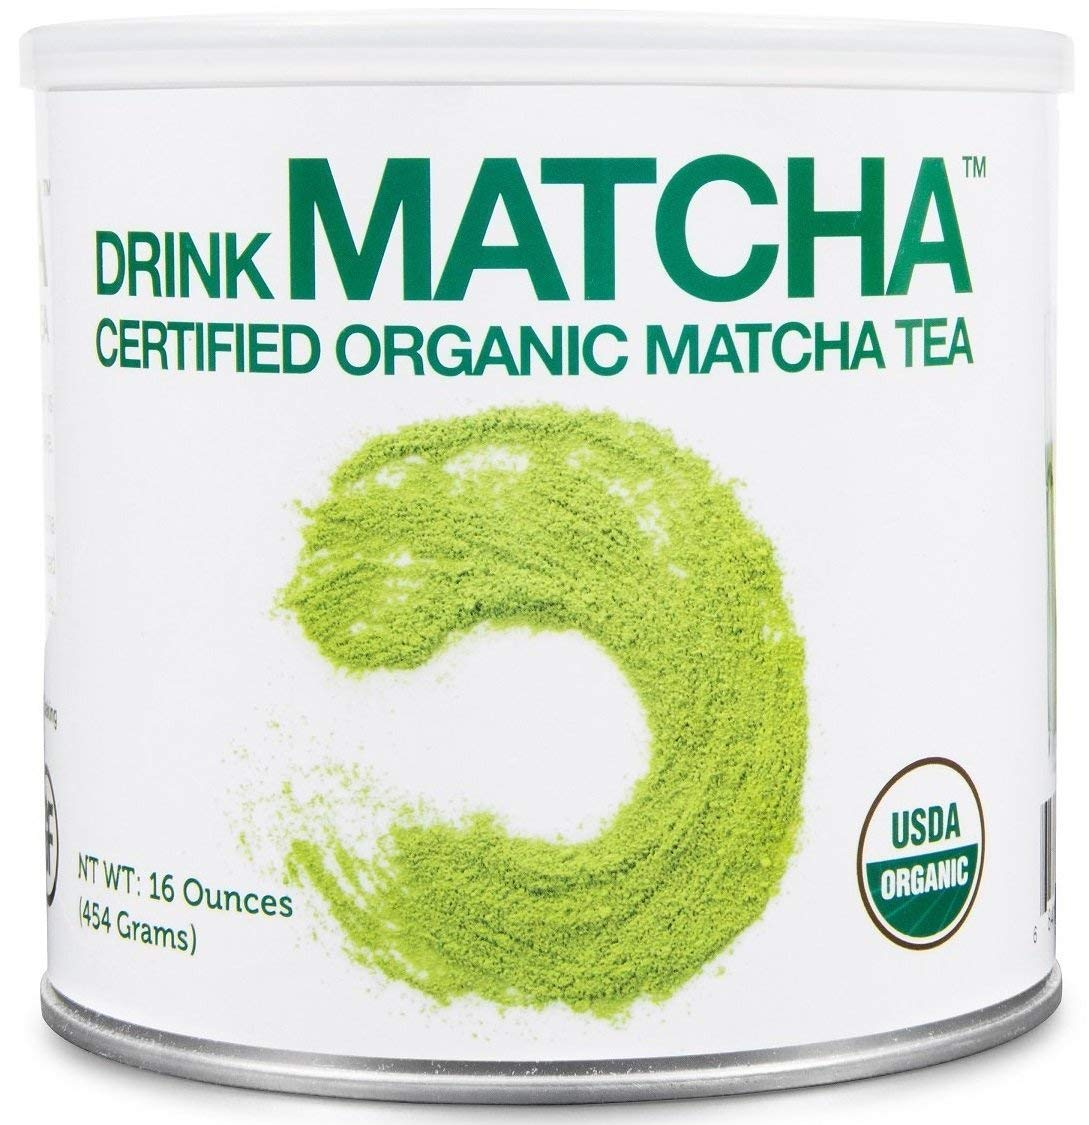 DrinkMatcha - Matcha Green Tea Powder - USDA Organic - 100% Pure Matcha Green tea Powder - Nothing added (16 Ounce) by MatchaDNA